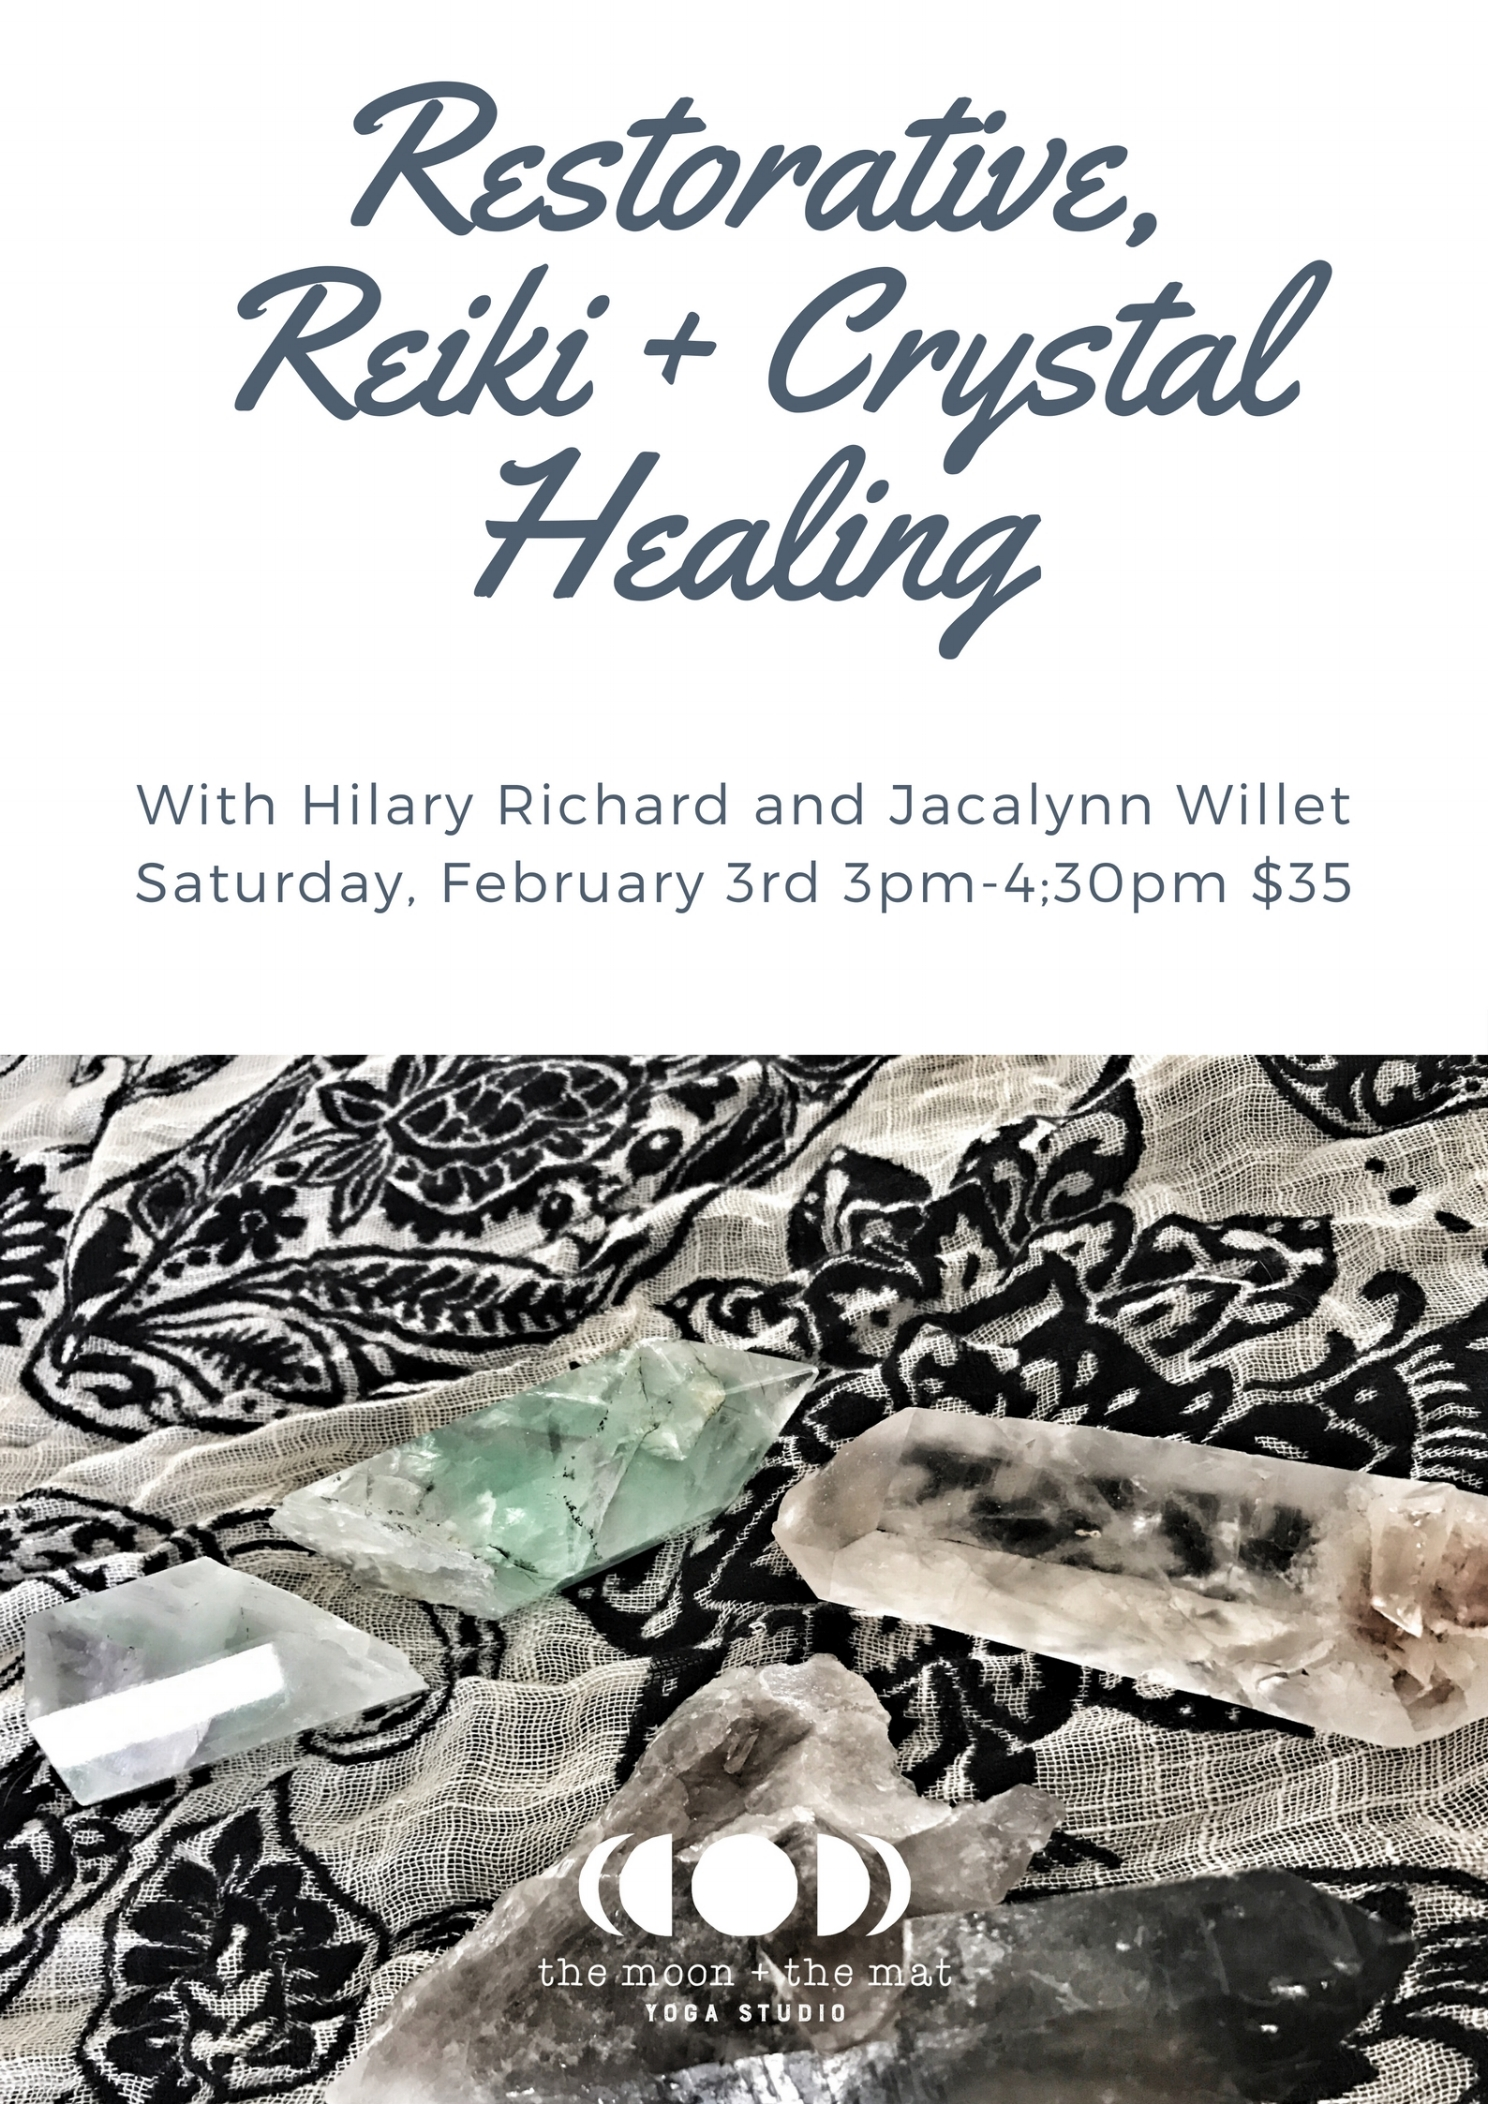 Copy of Restorative, Reiki + Crystal Healing.jpg